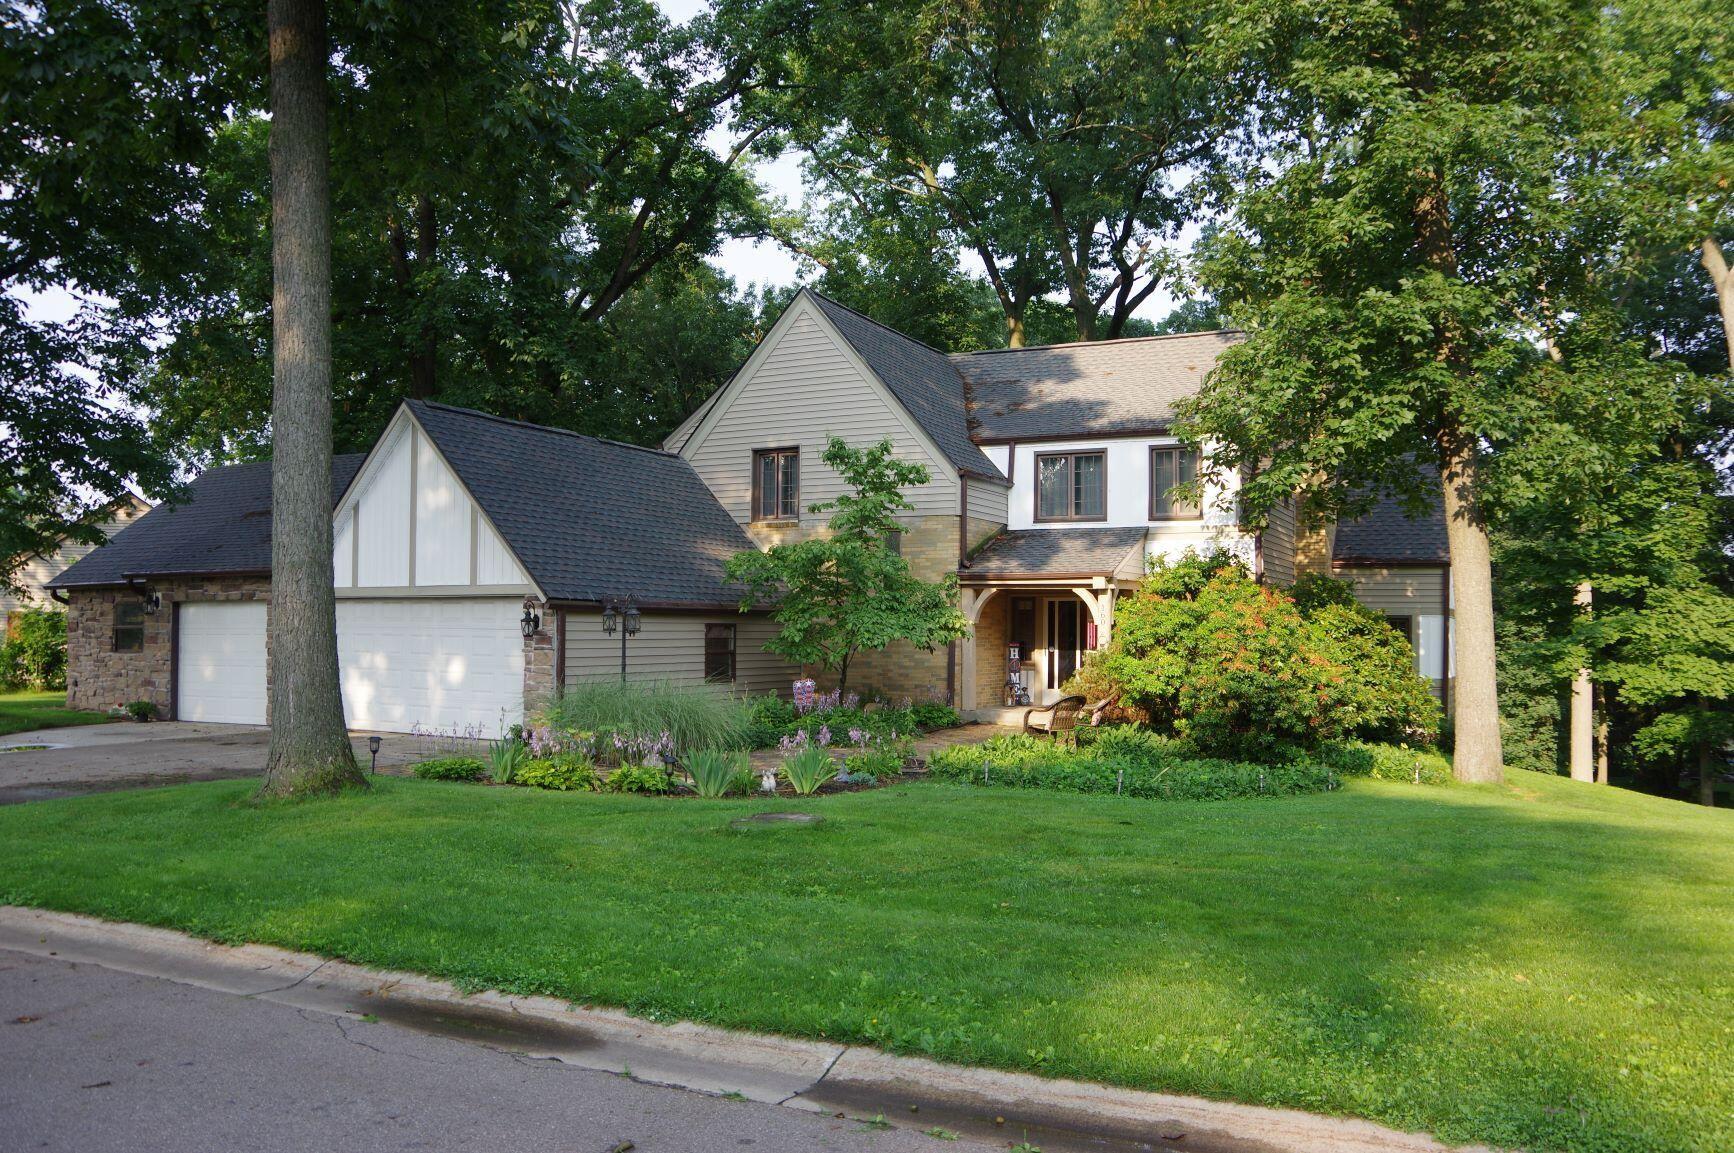 160 Shadywood Lane, Battle Creek, MI 49015 - MLS#: 21064789